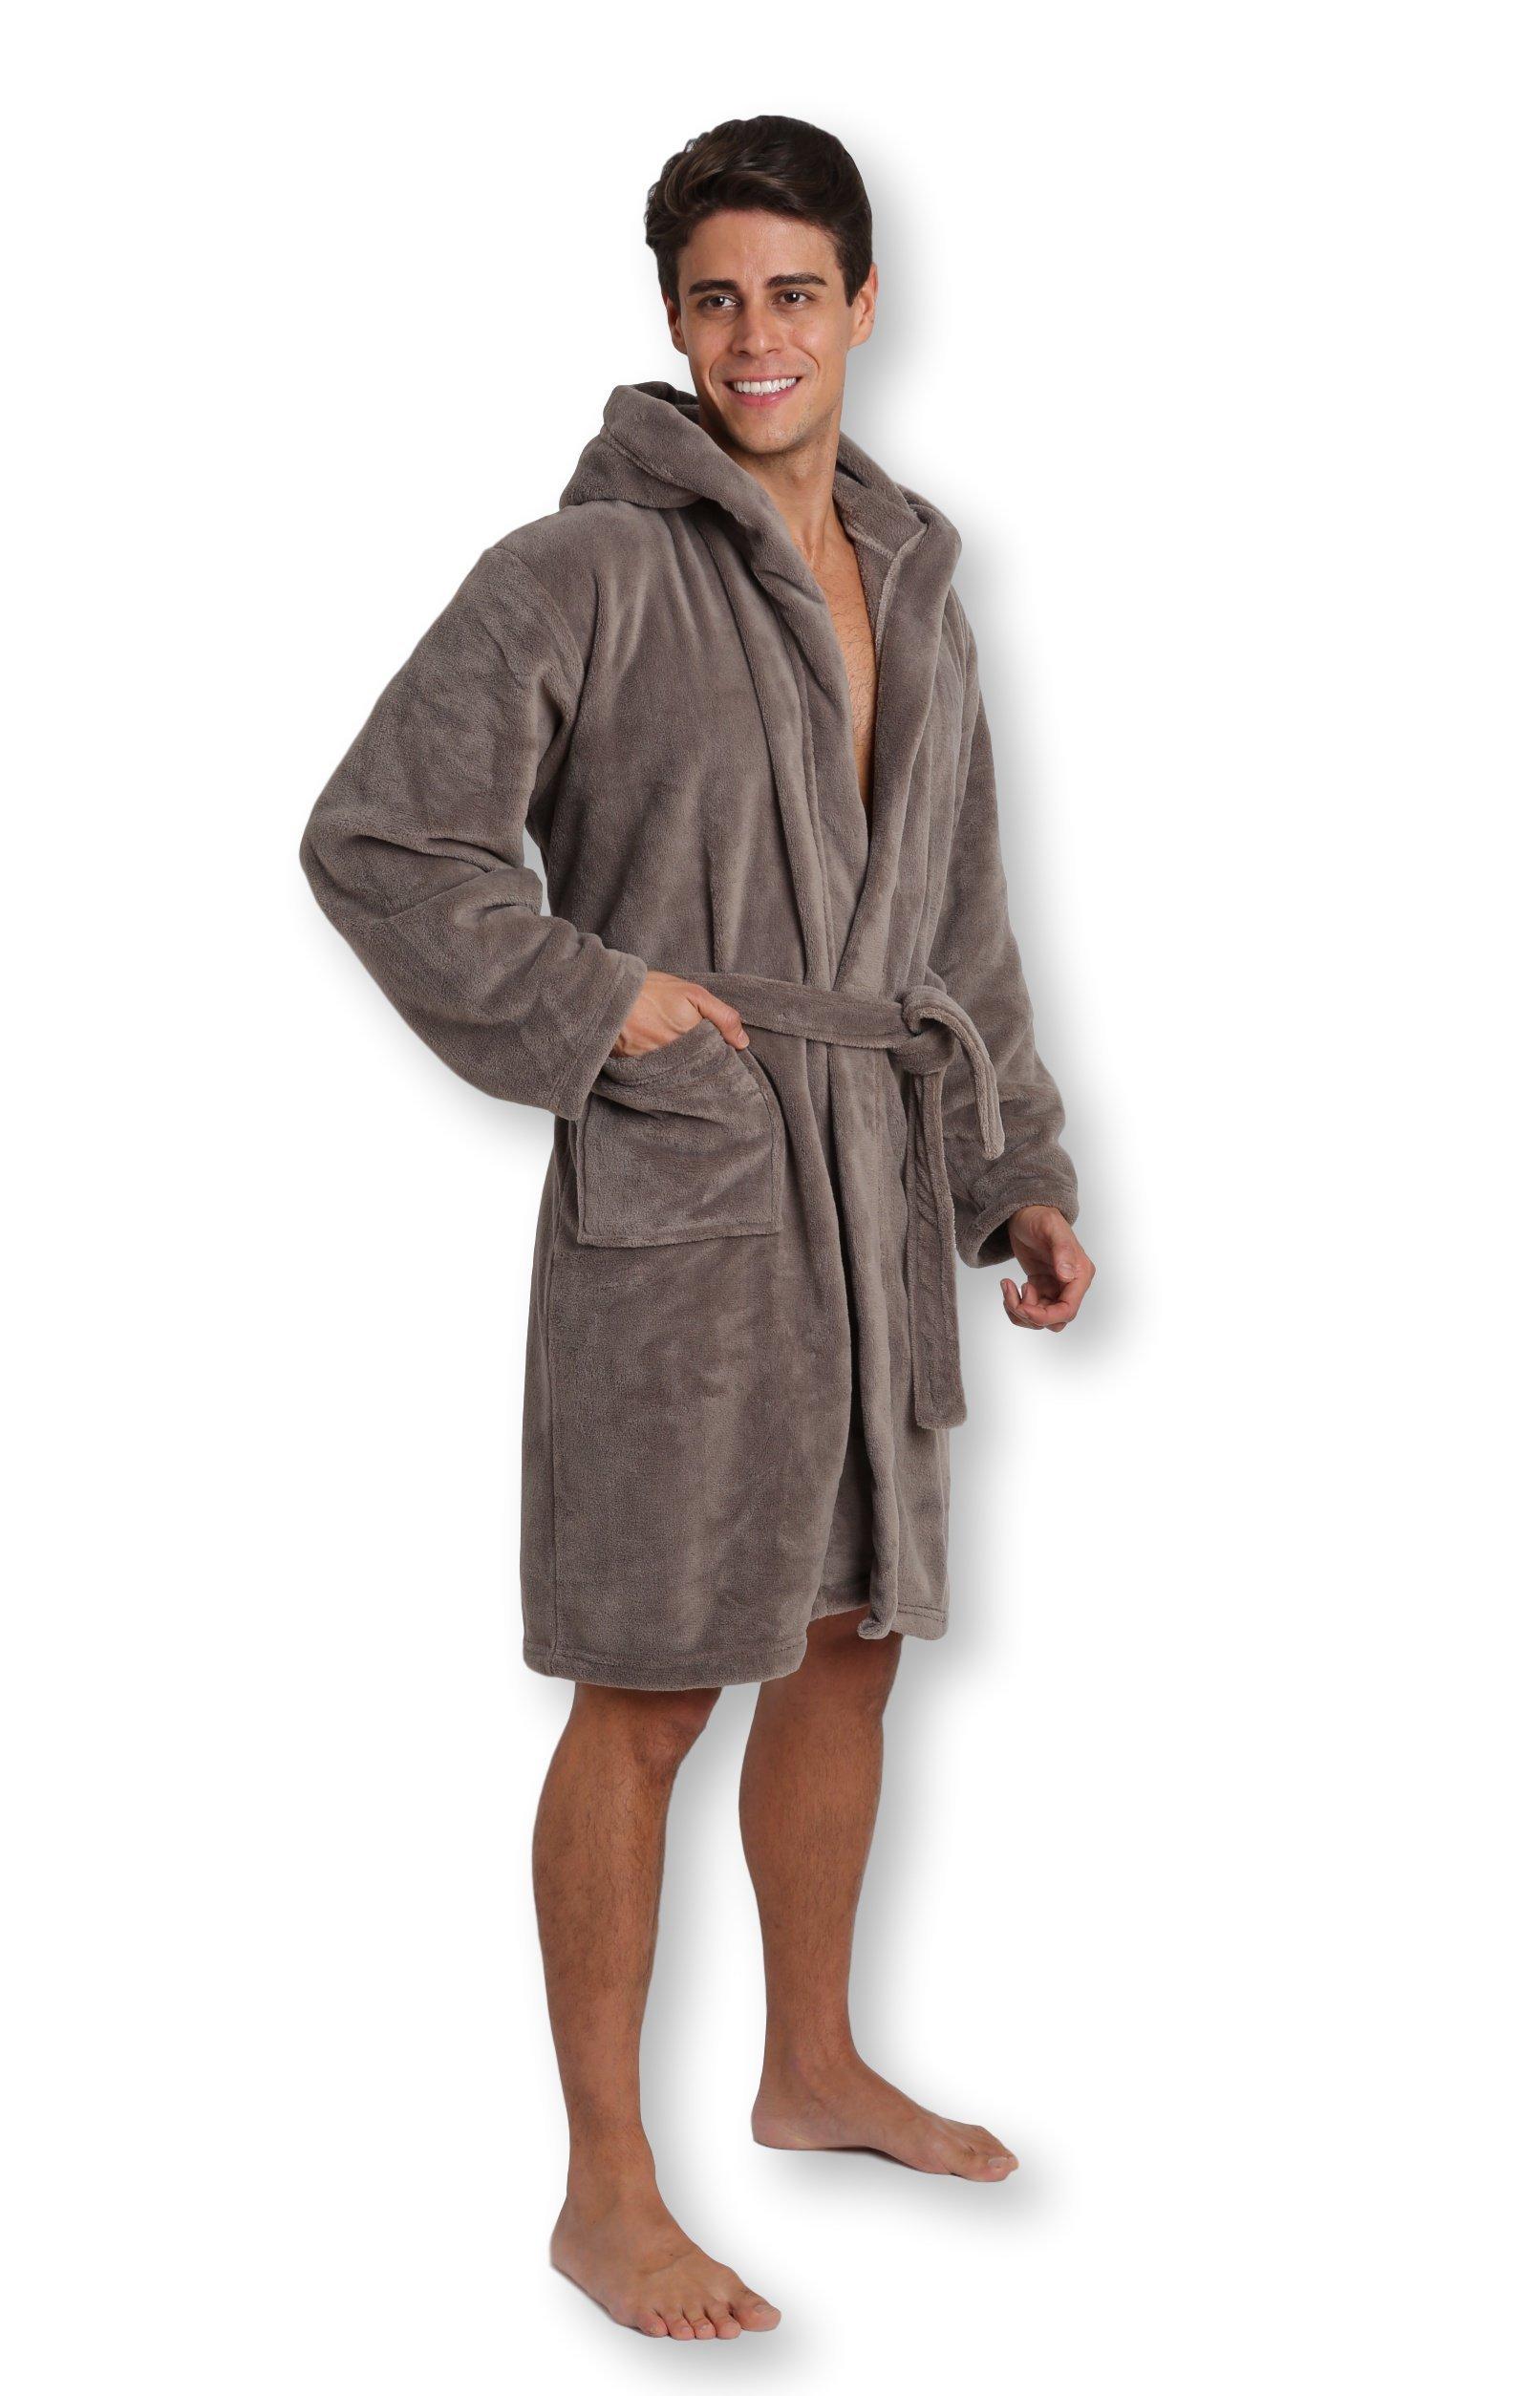 Pembrook Men's Robe with Hood – Gray - Size L/XL - Soft Fleece – Hotel Spa Bathrobe by Pembrook